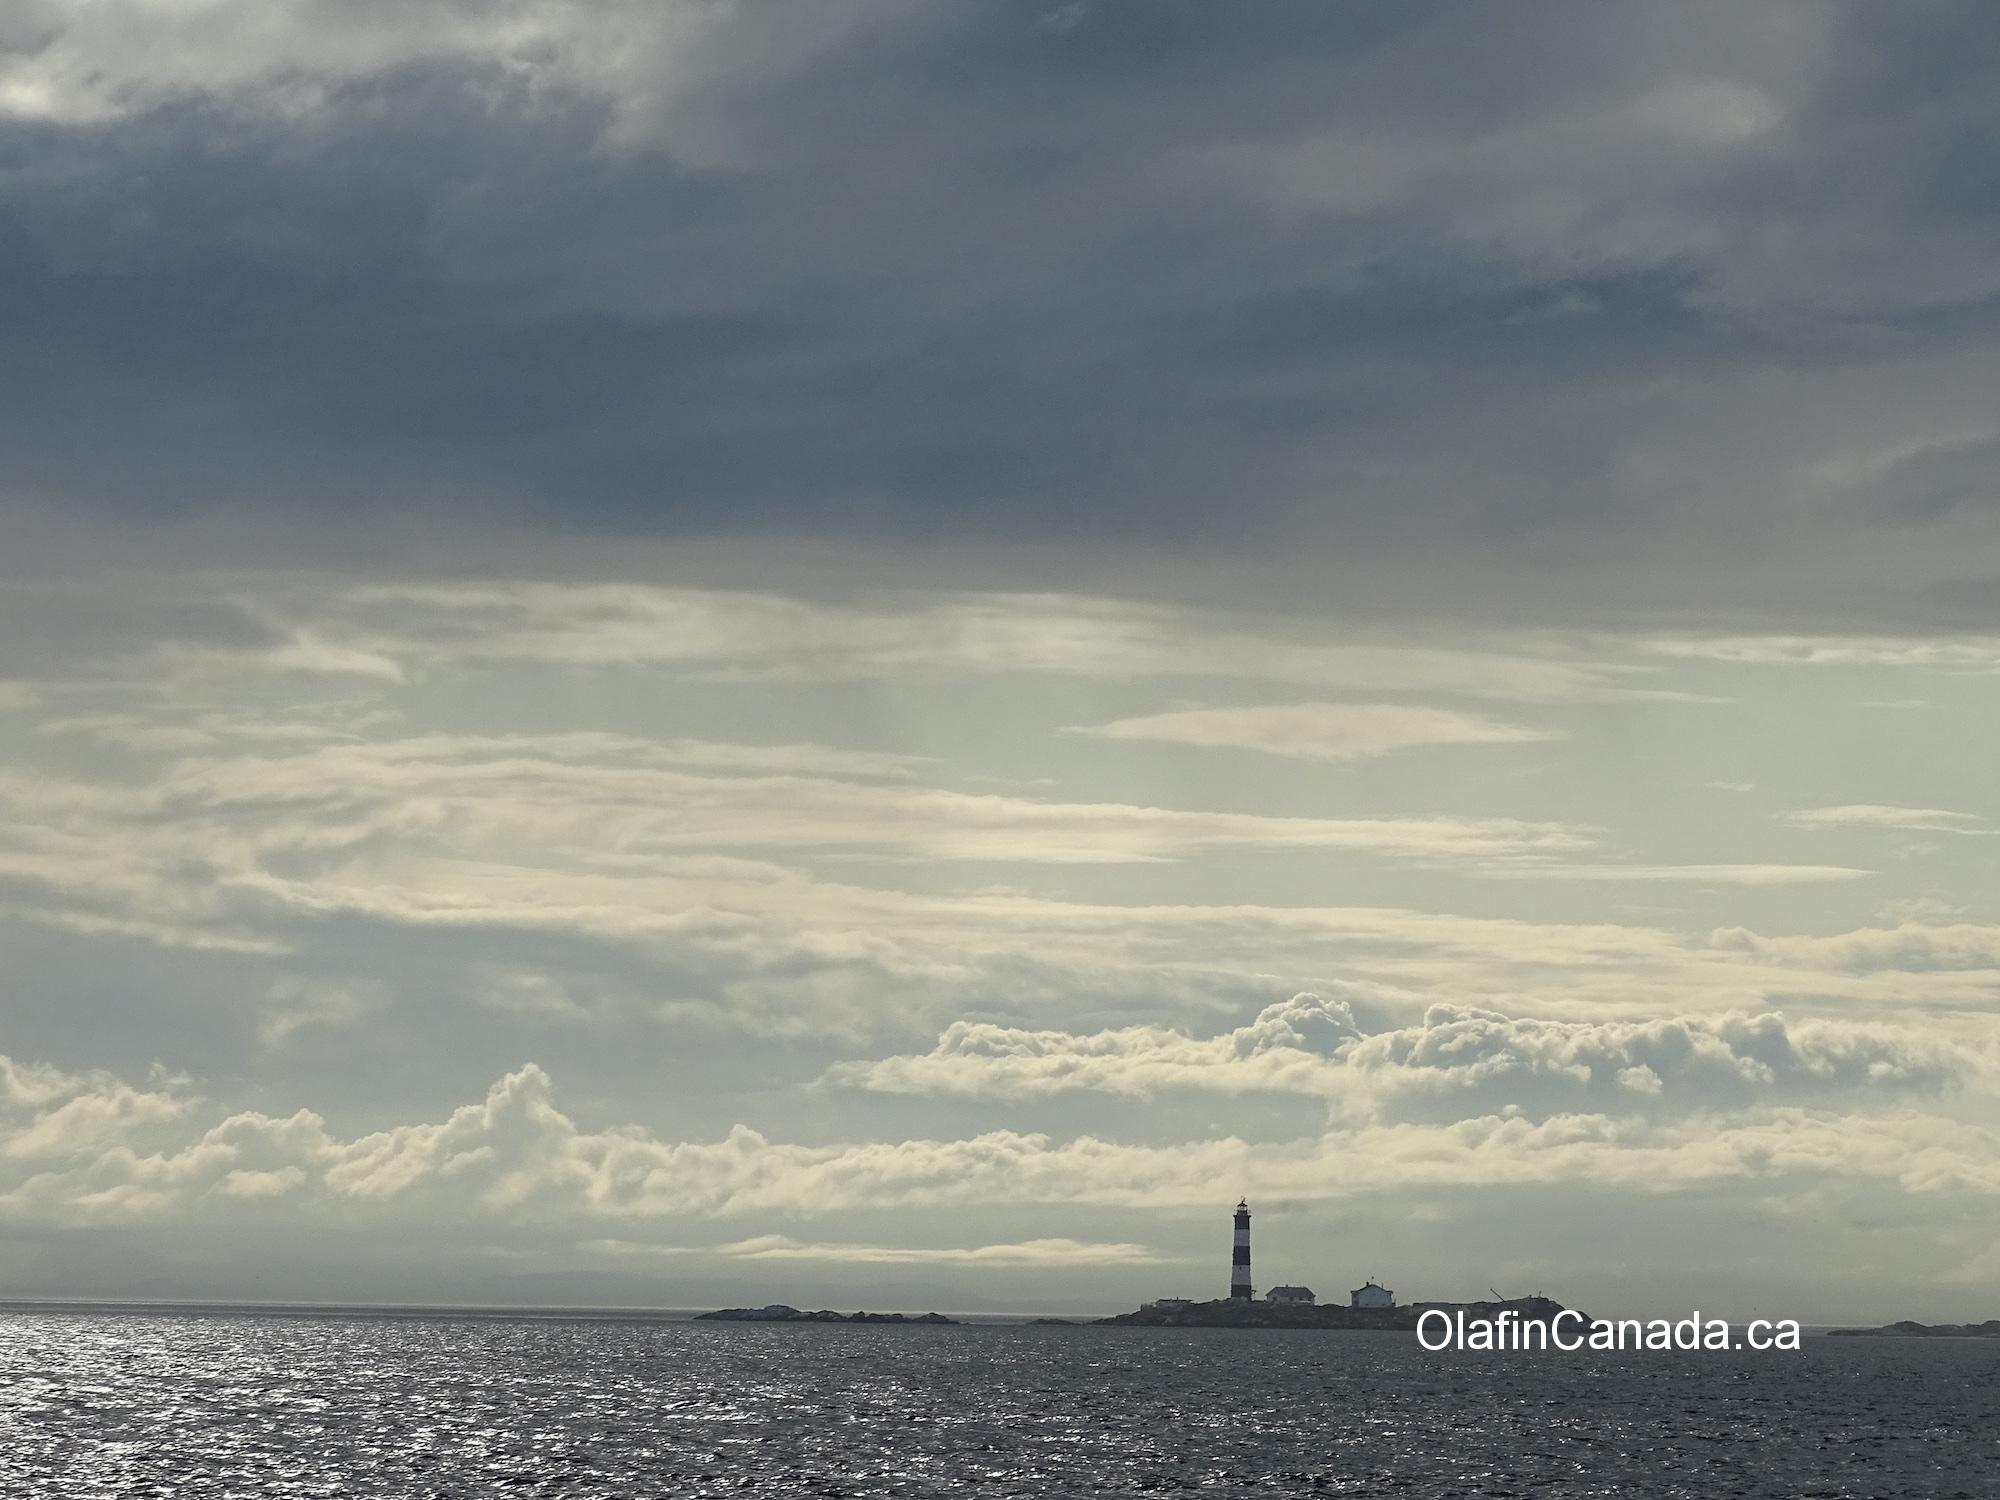 Lighthouse Victoria #olafincanada #britishcolumbia #discoverbc #victoria #lighthouse